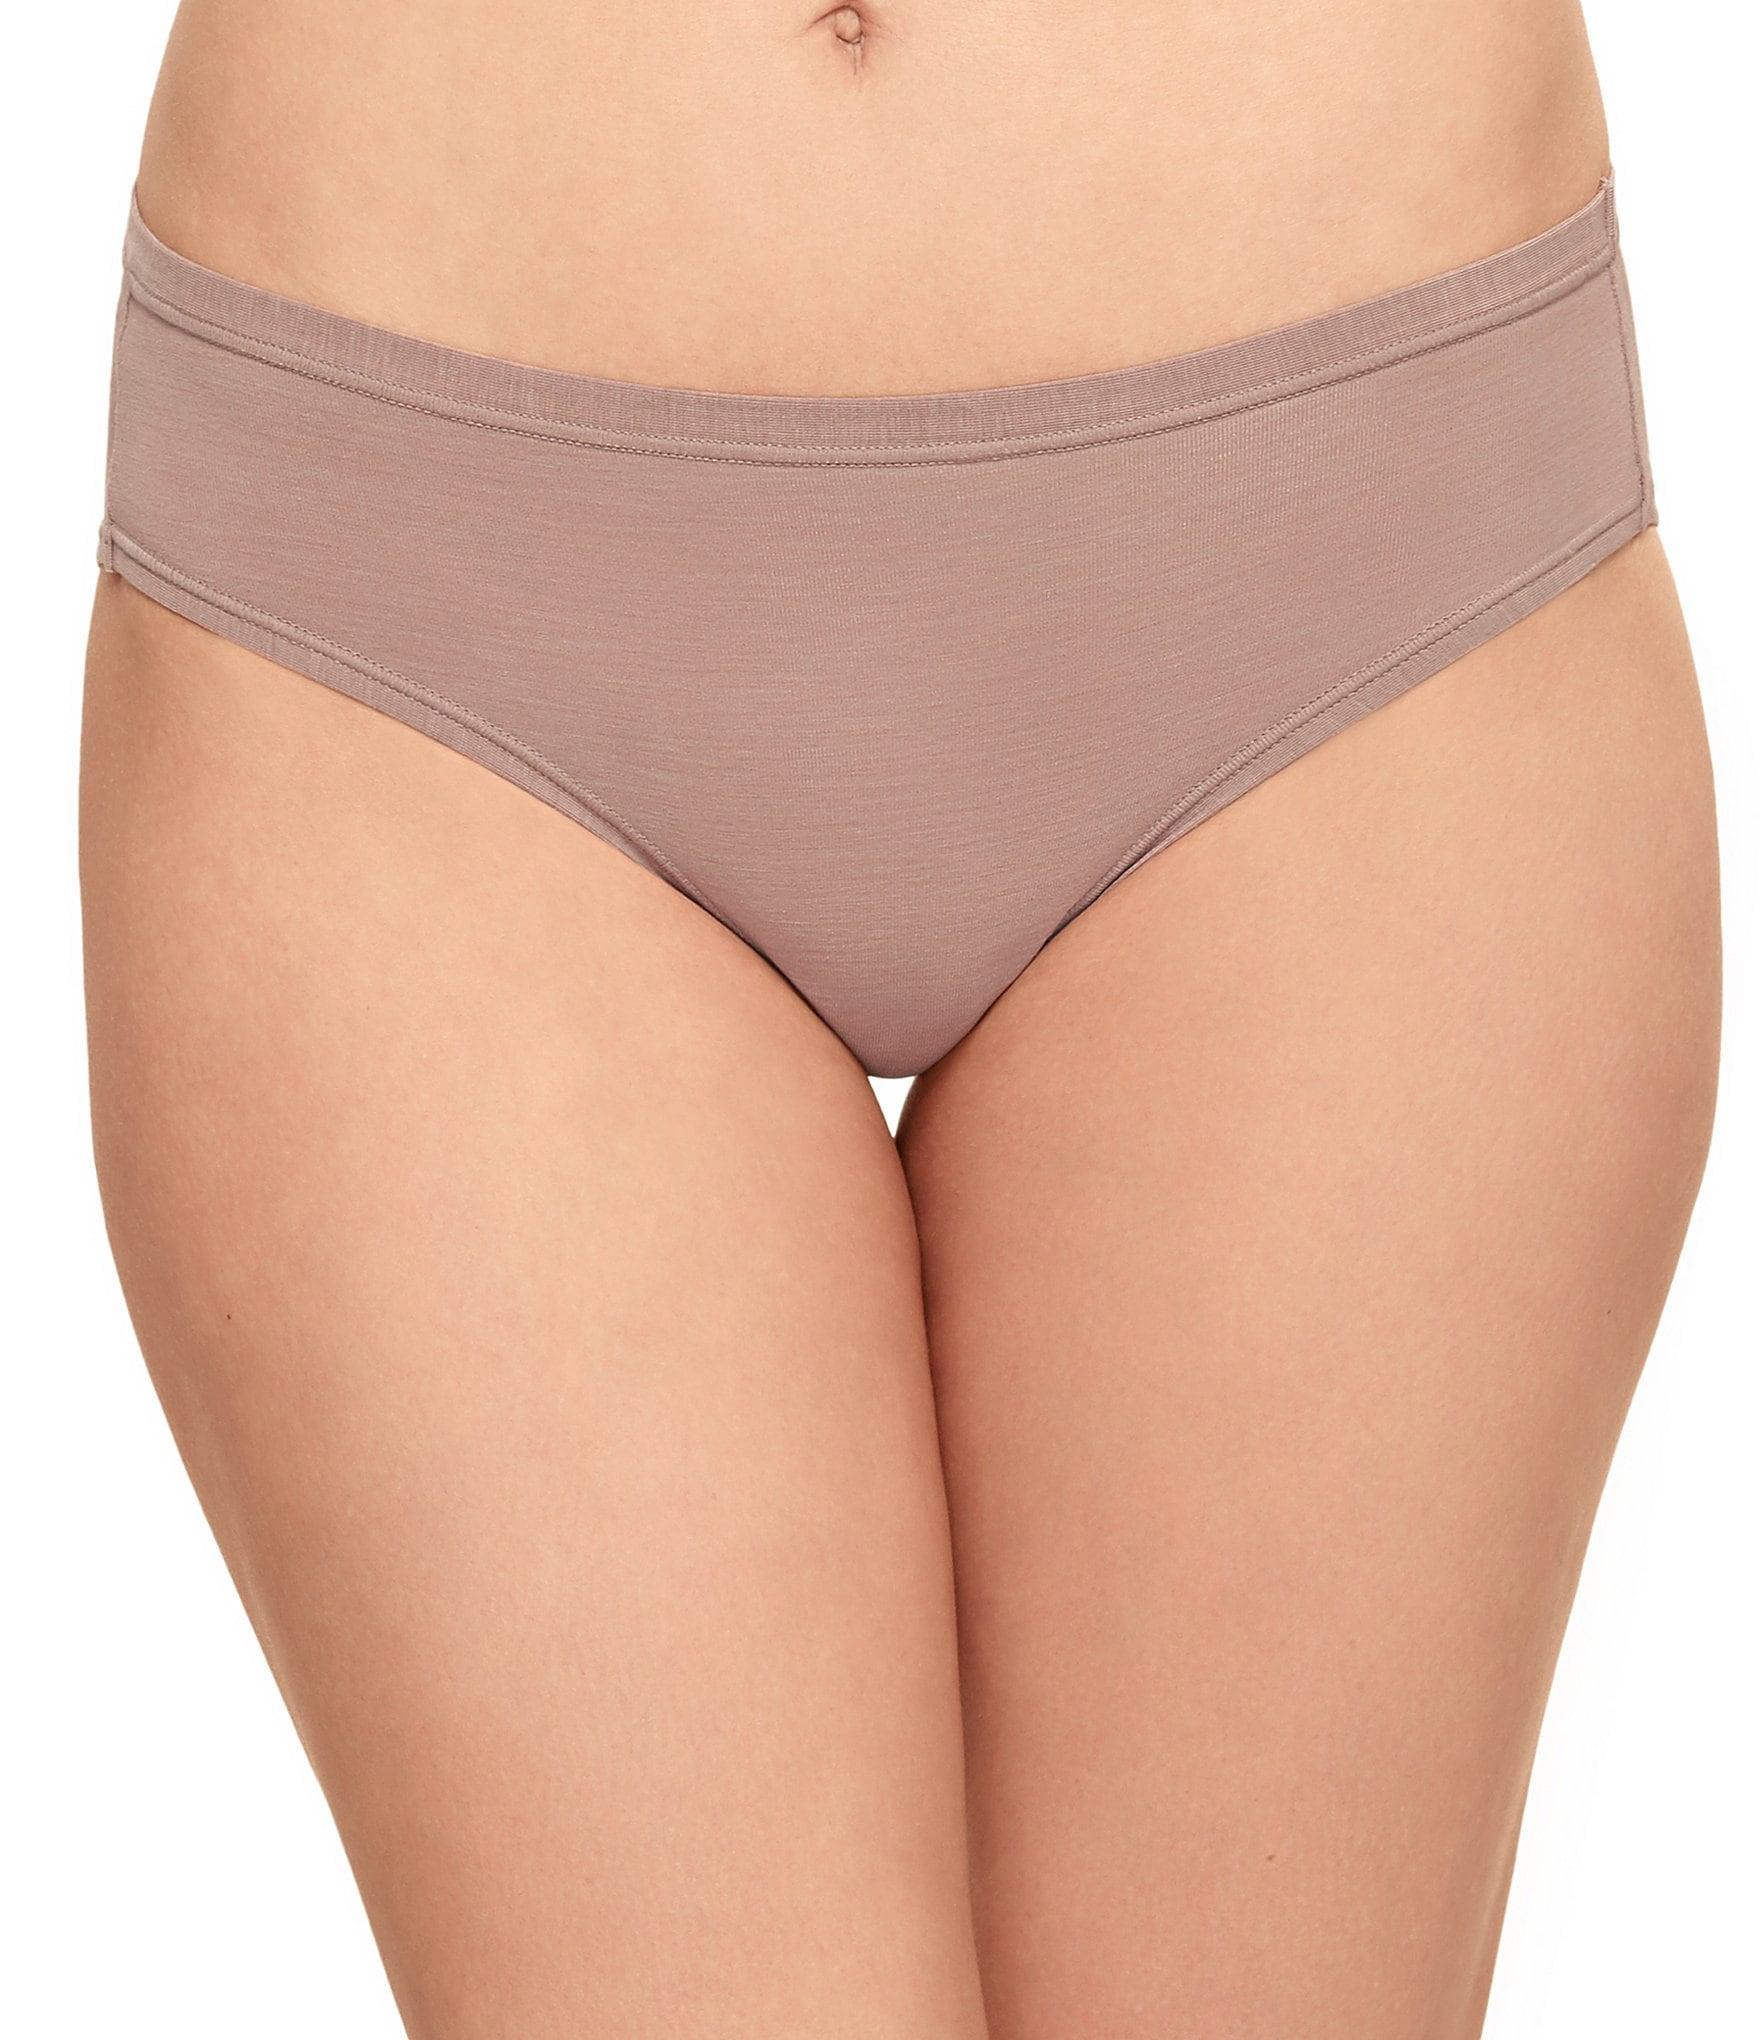 ee68ea72f0a5 solid see: Women's Panties & Underwear | Dillard's